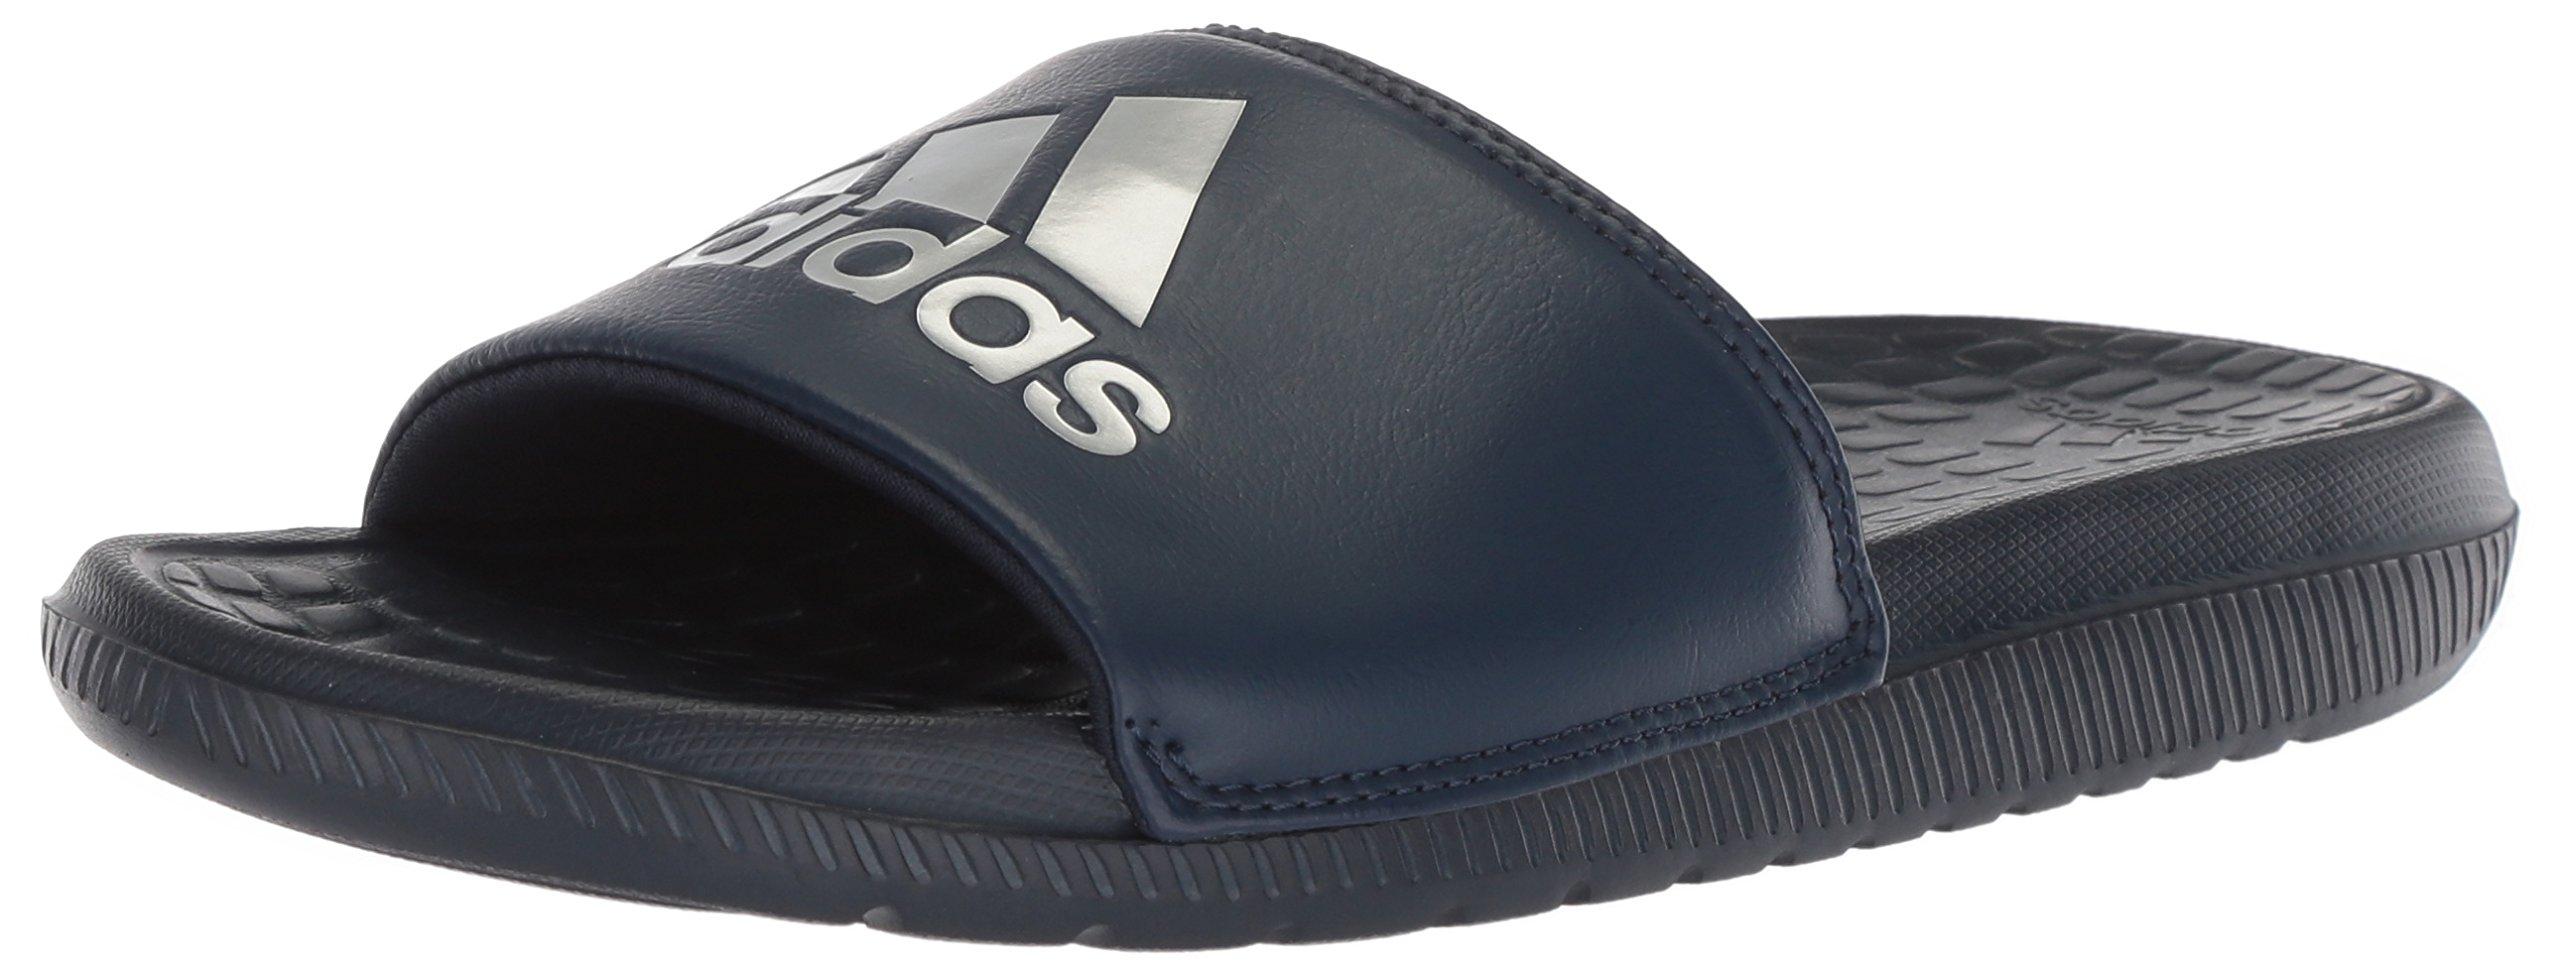 adidas Performance Men's Voloomix Slide Sandal, Collegiate Navy/Silver Metallic/Collegiate Navy, 16 M US